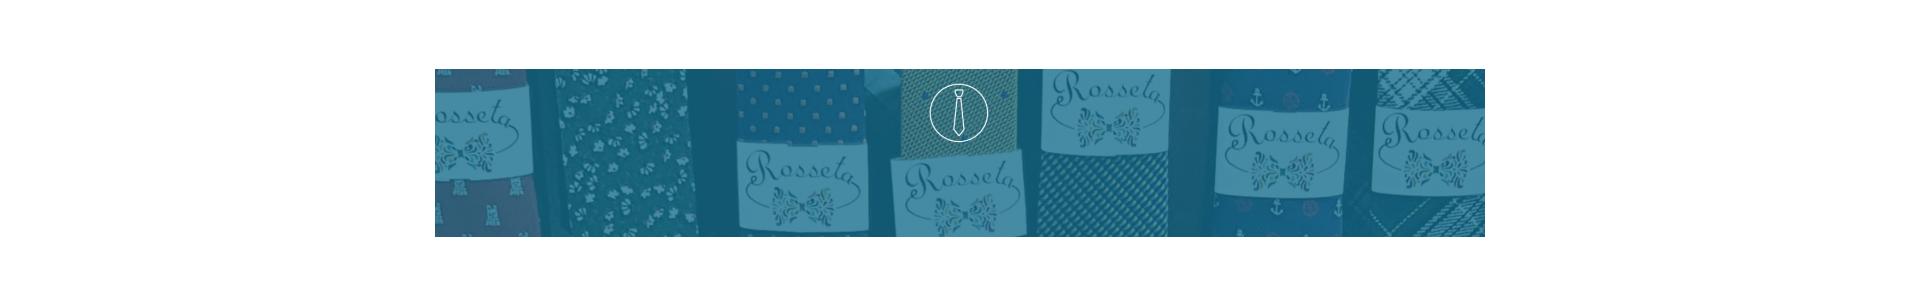 Corbatas originales hechas a mano | Rosseta Pajaritas